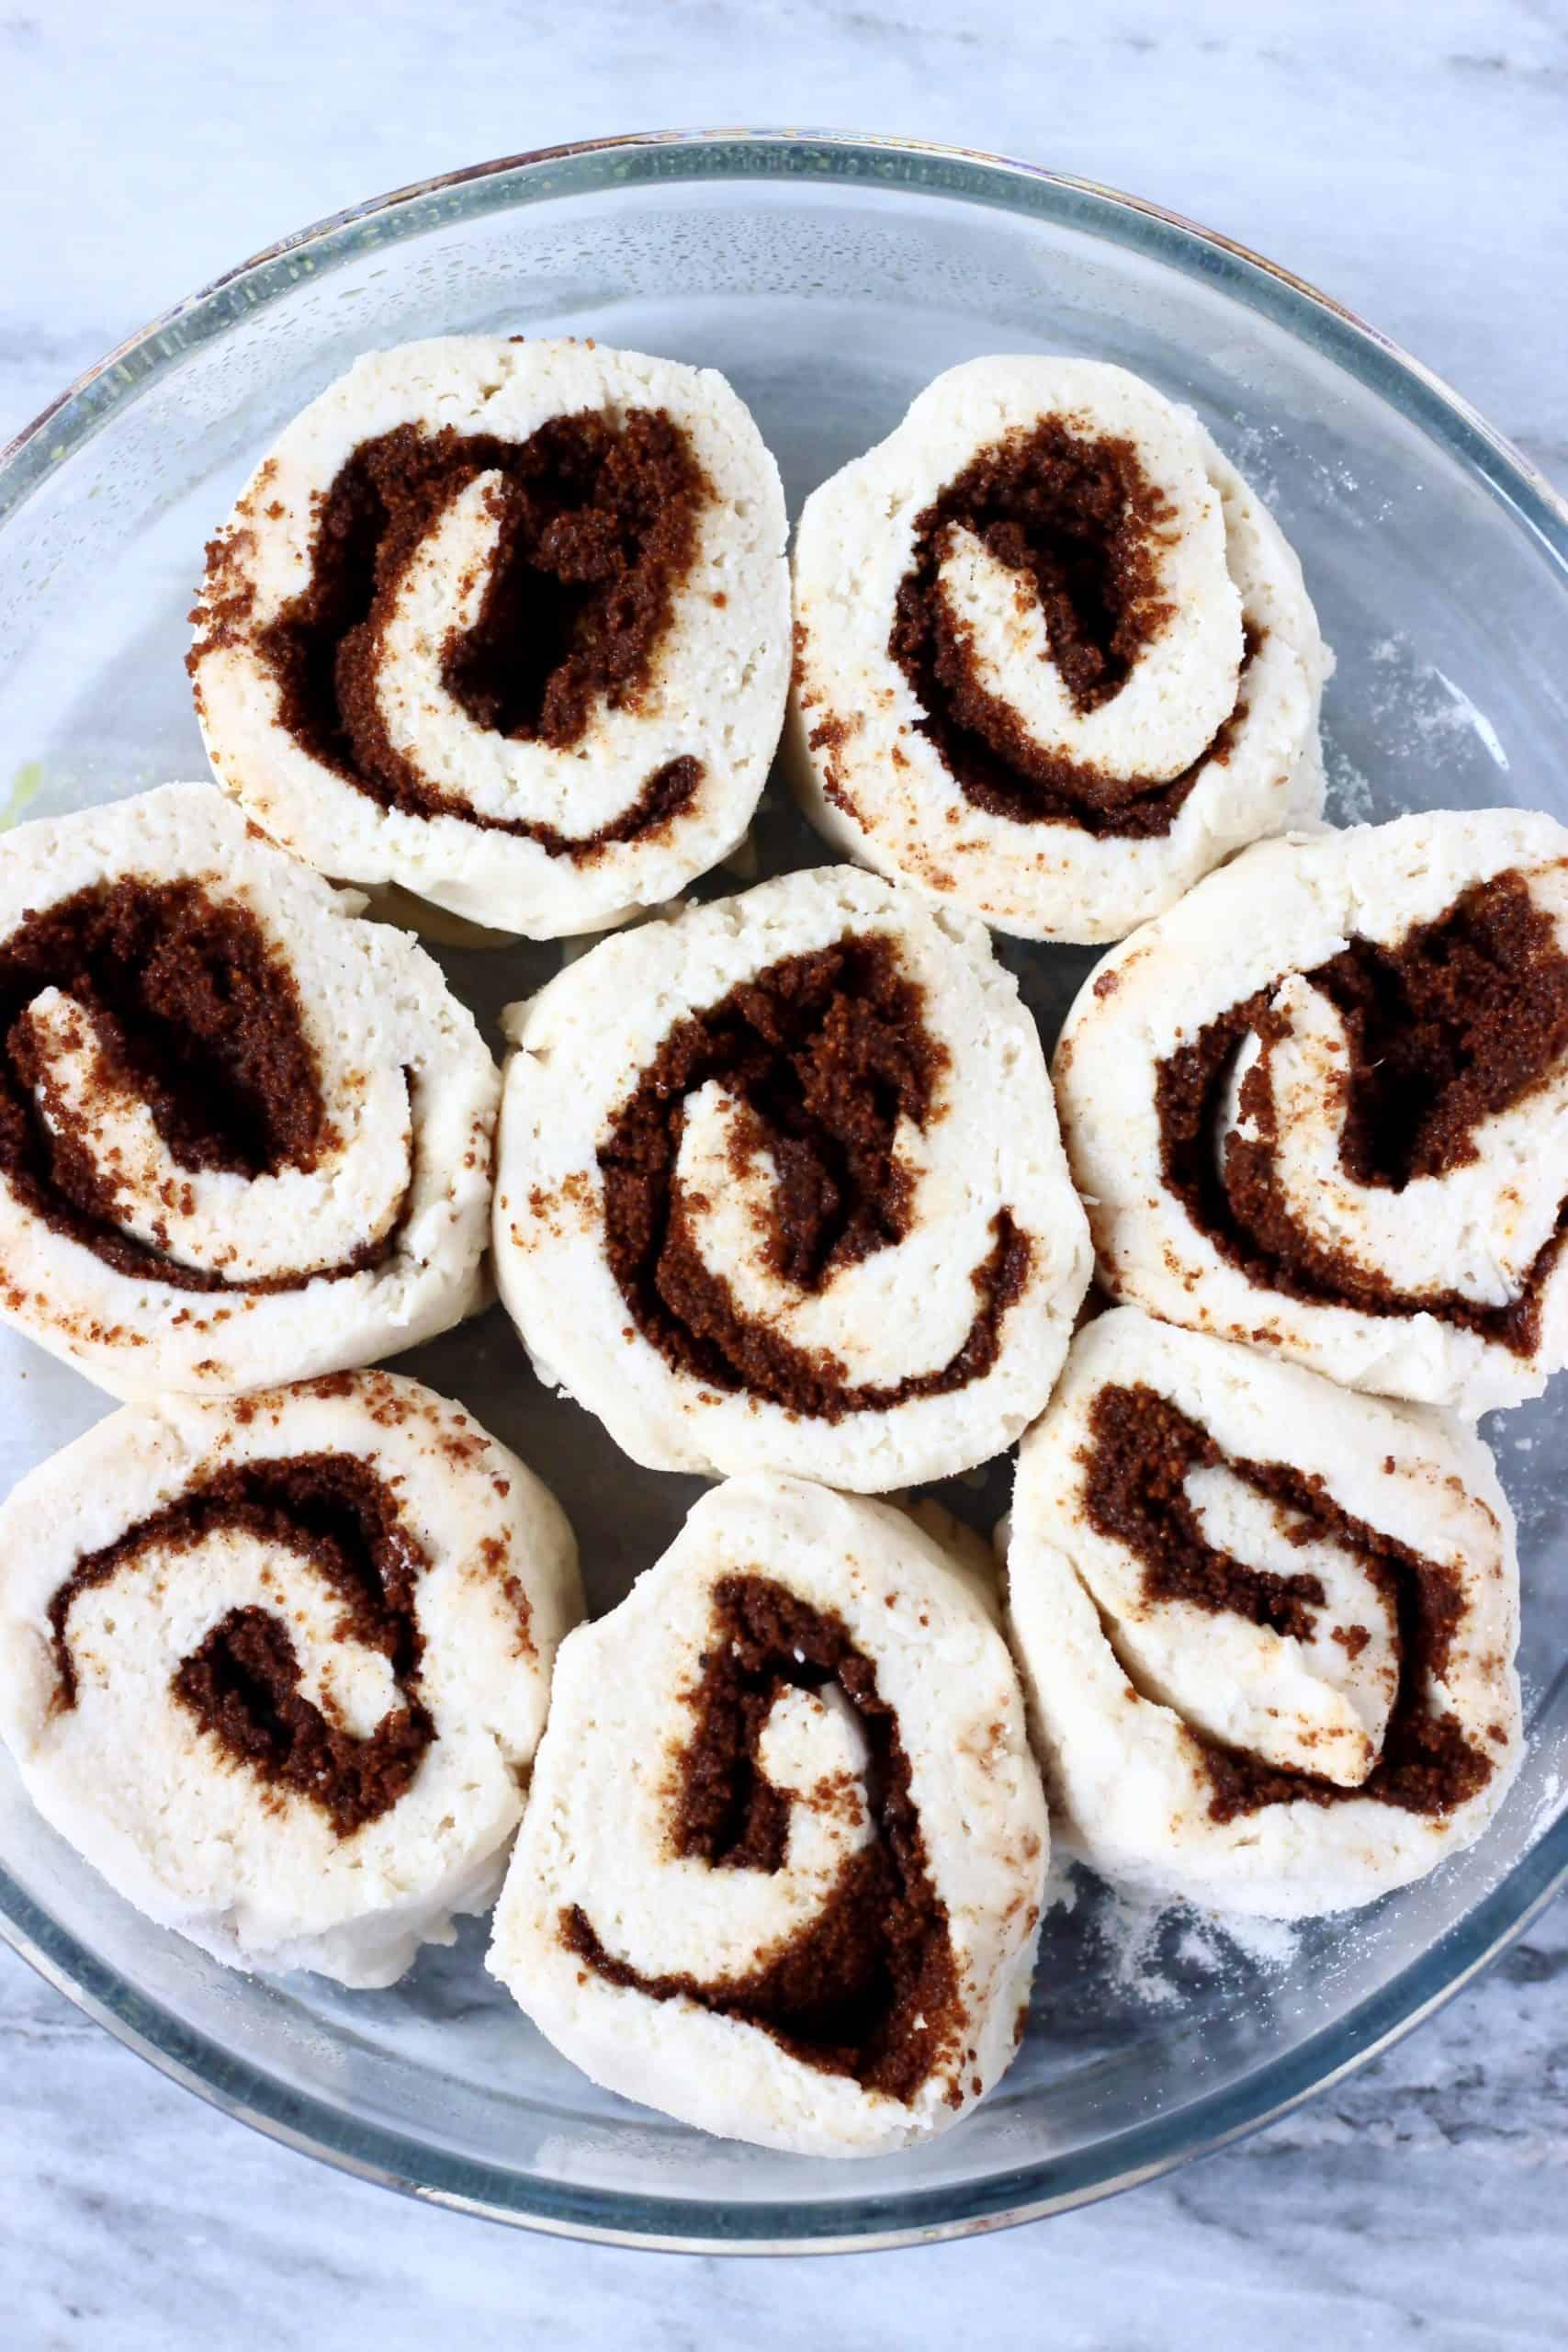 Eight raw gluten-free vegan cinnamon rolls in a round baking dish before proving